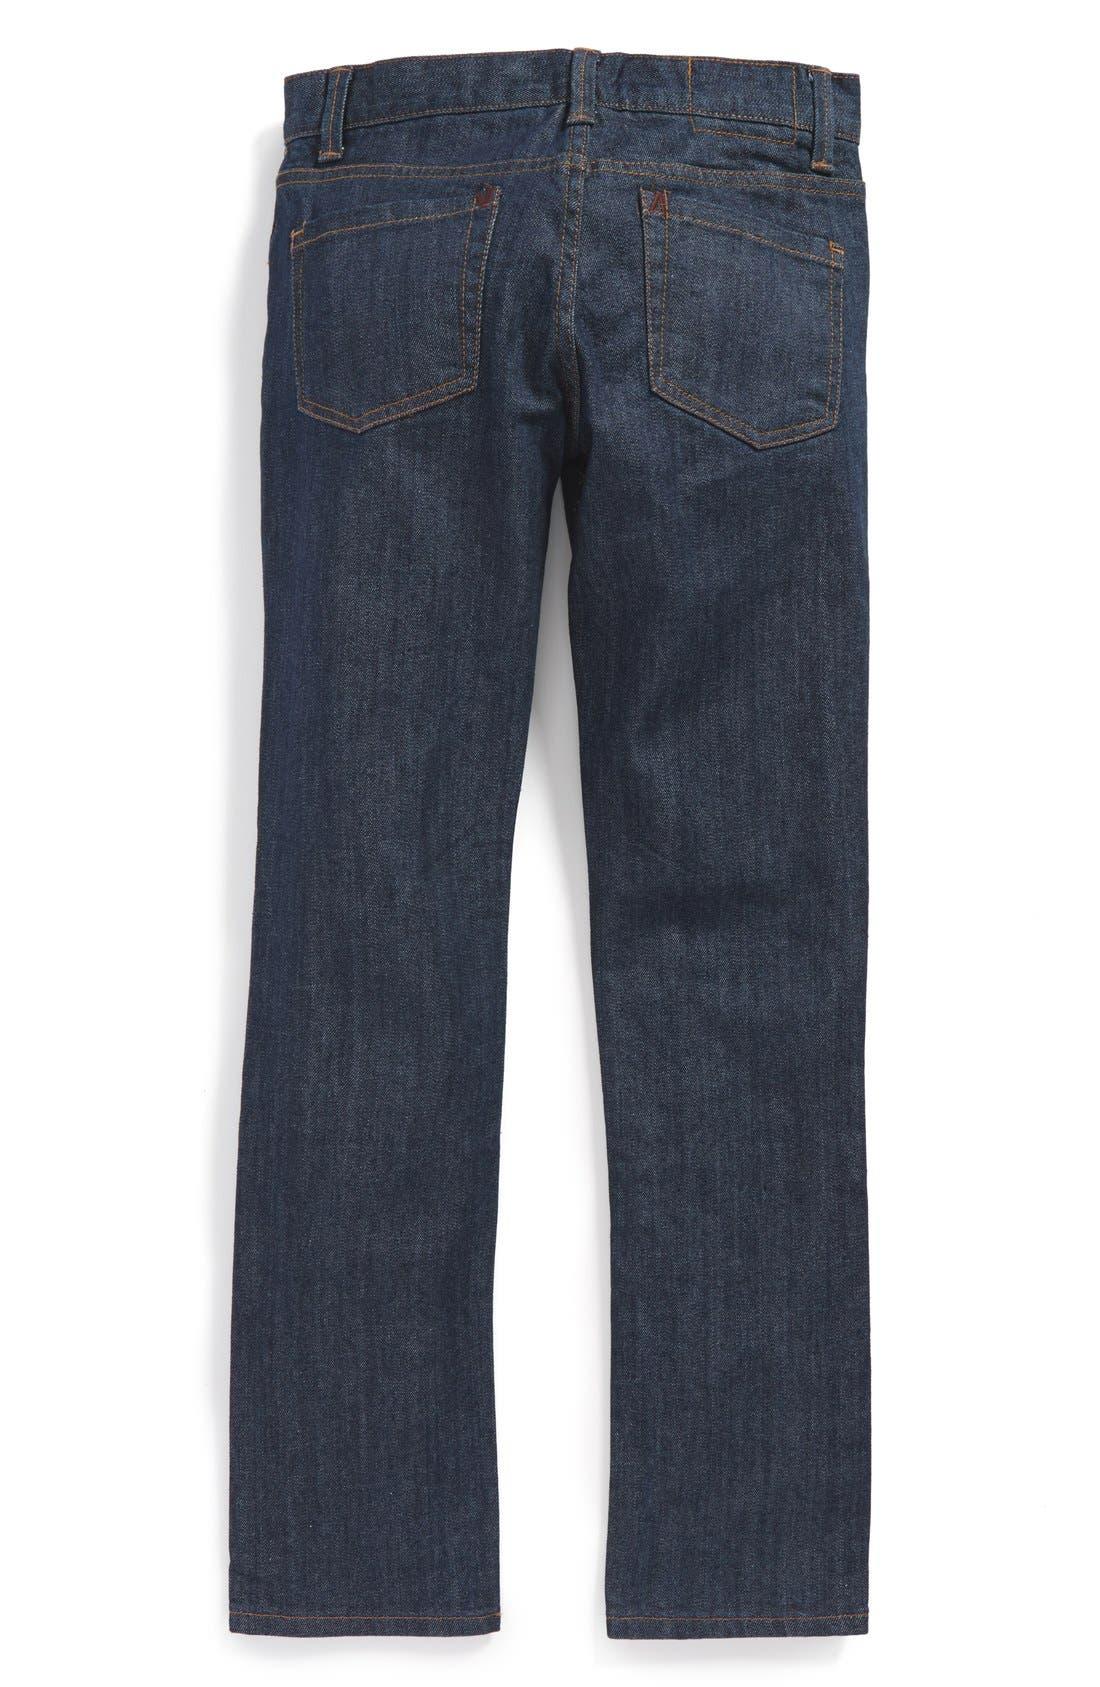 Main Image - RVCA 'Regulars Extra' Straight Leg Jeans (Big Boys)